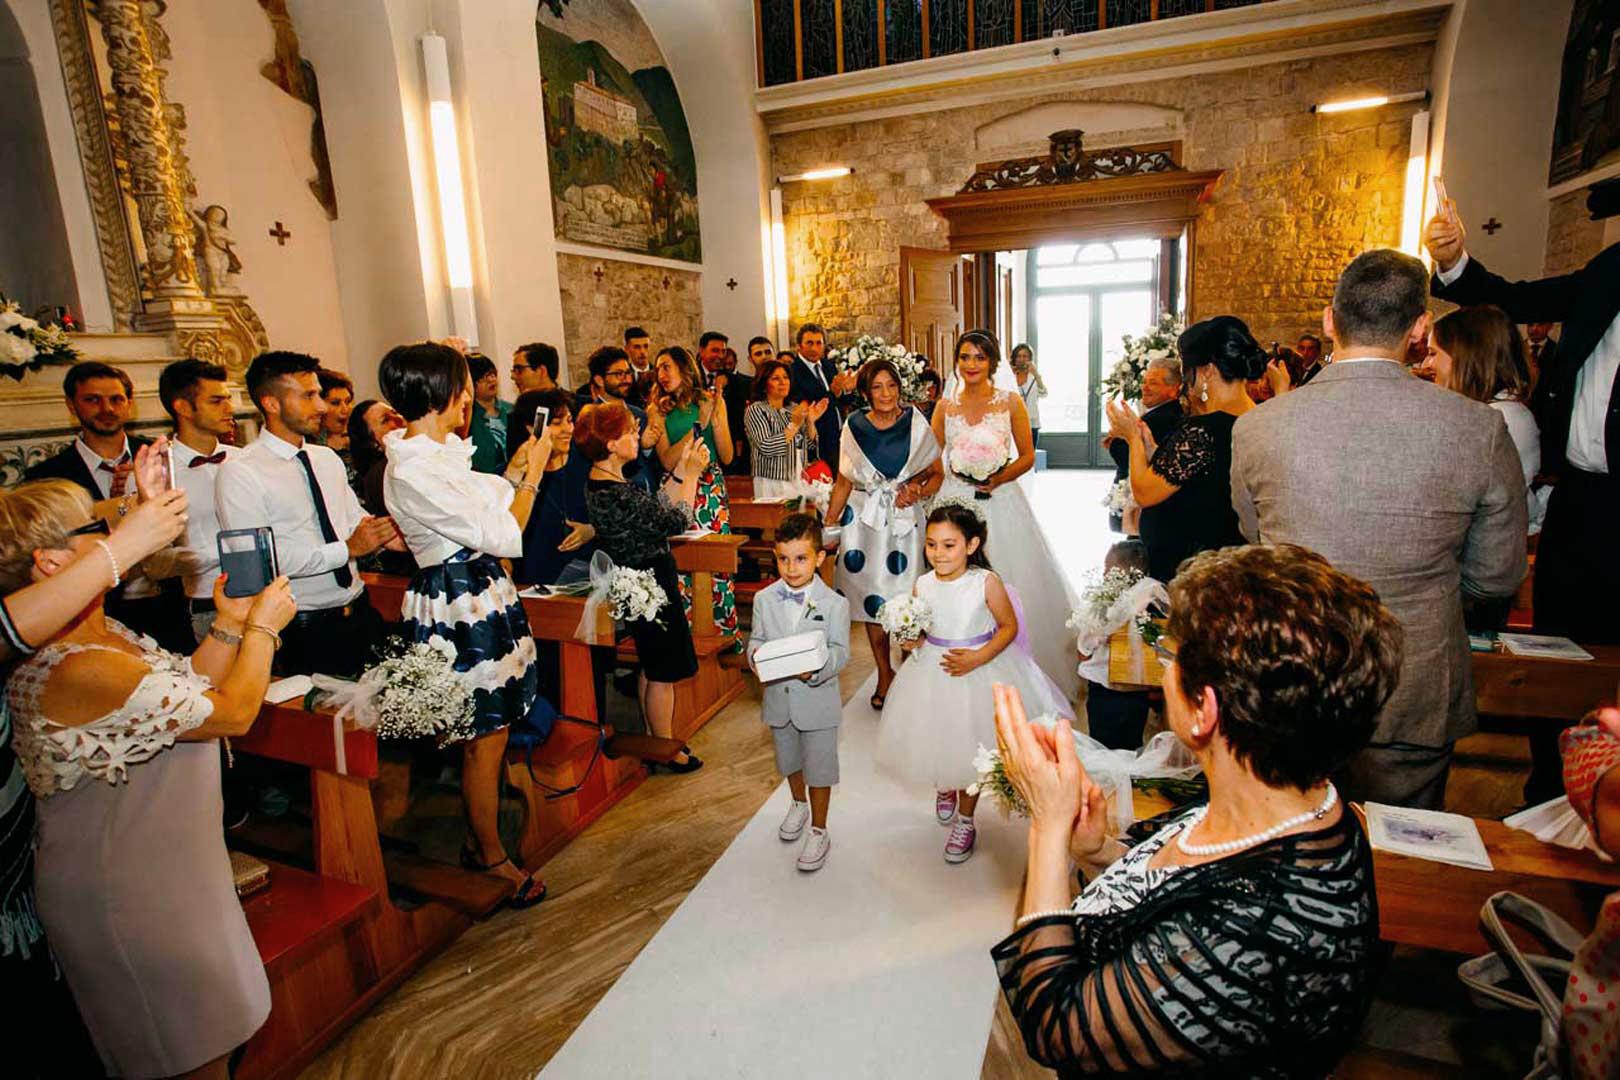 014-arrivo-chiesa-matrimonio-italia-gianni-lepore-fotografo